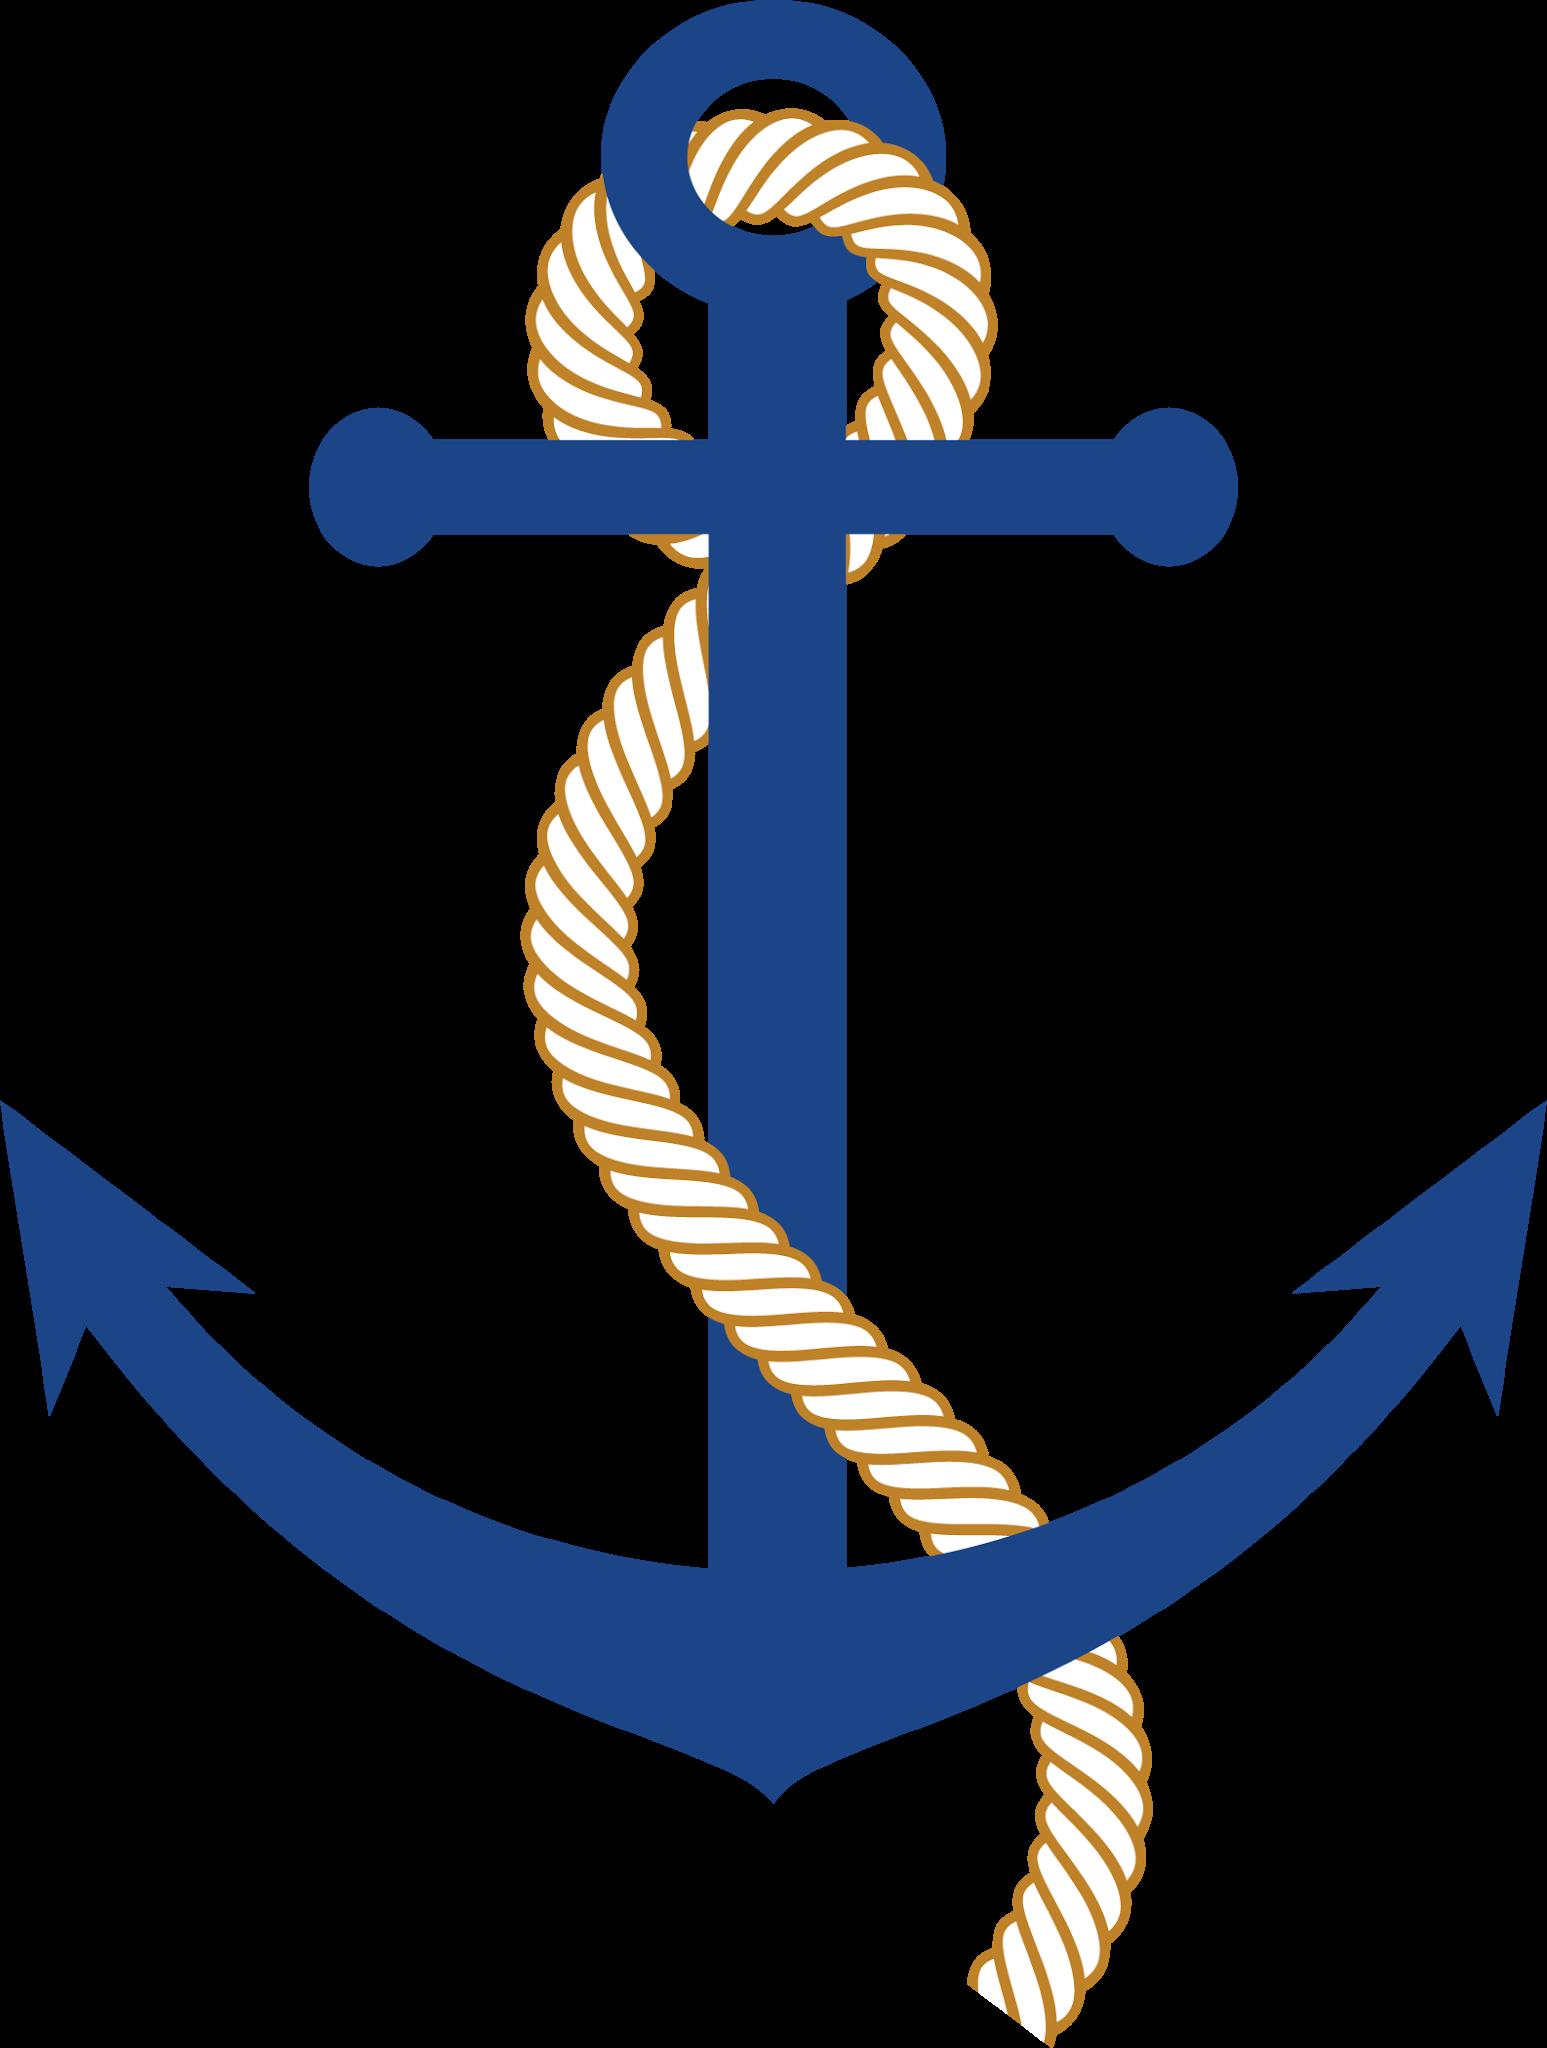 Lighthouse clipart nautical theme, Lighthouse nautical theme.